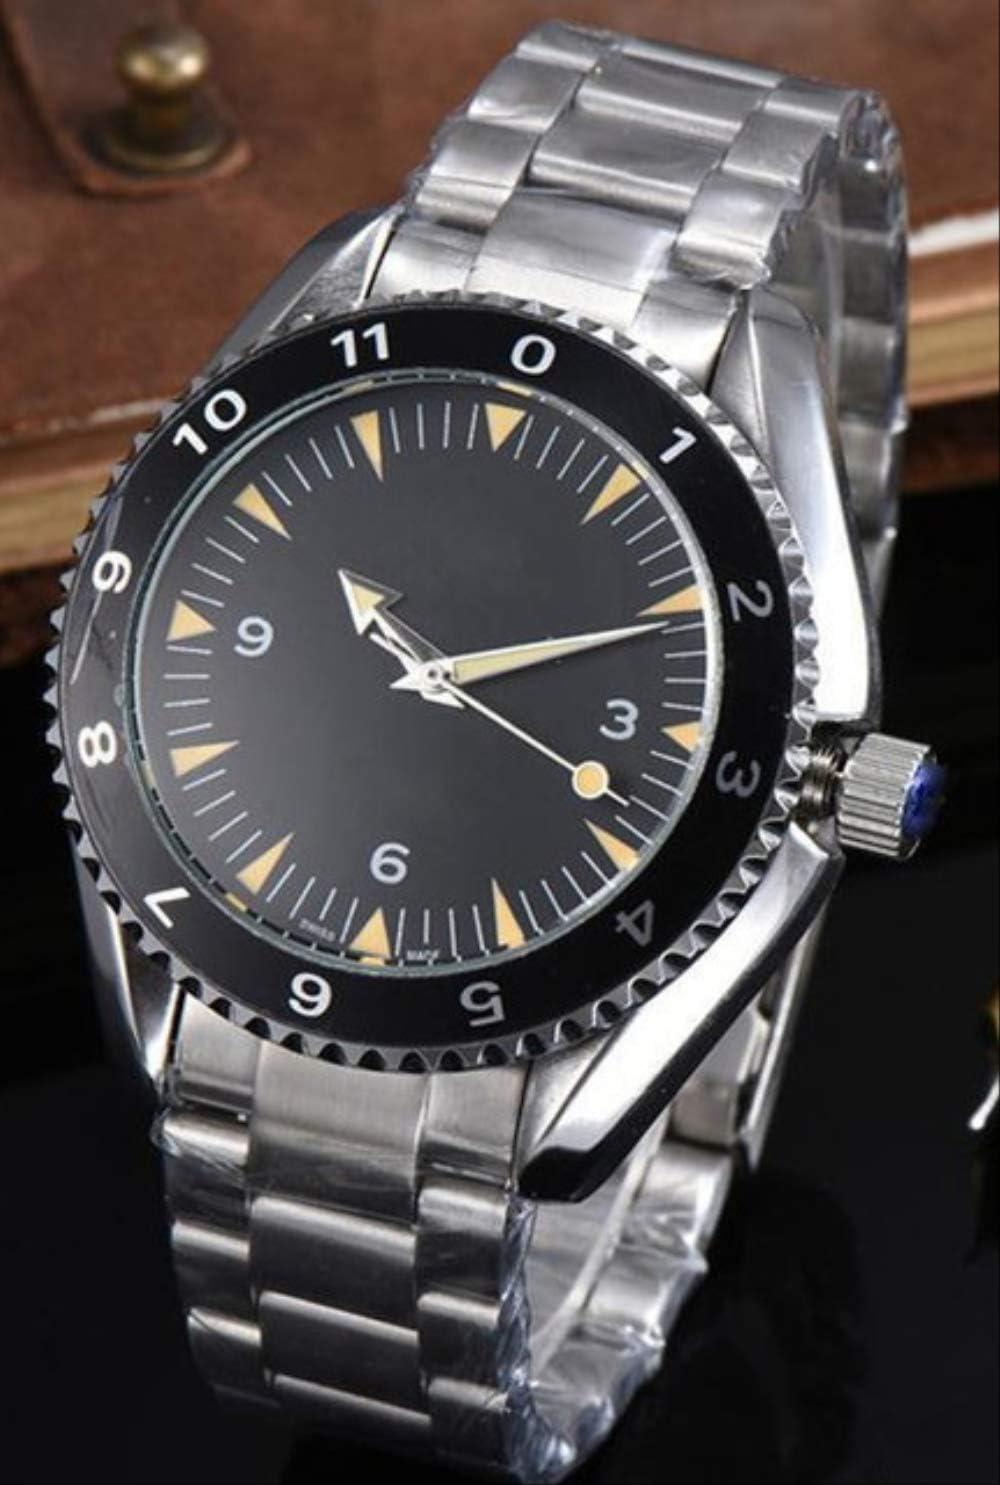 AHELUSB Relojes mecánicos automáticos Hombre James Bond 007 Spectre Sport Reloj de Pulsera de Lona de Acero Inoxidable Vidrio con Respaldo deAcero